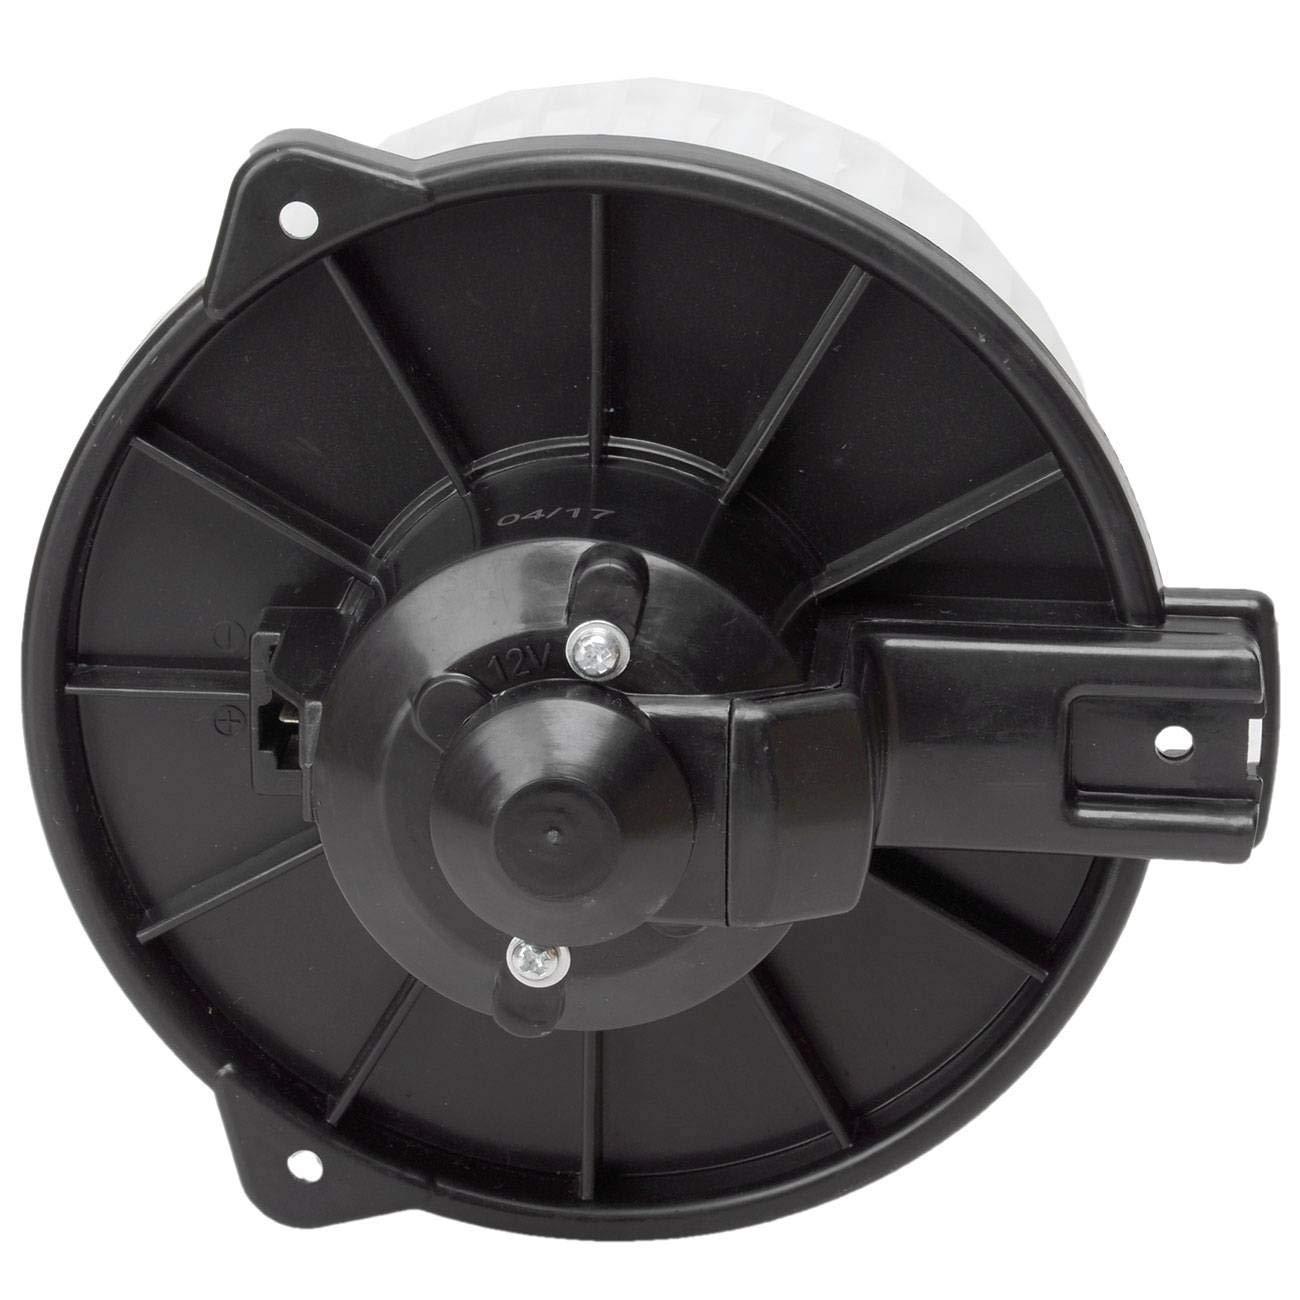 TOPAZ 8710302050 L/üftermotor Gebl/äse